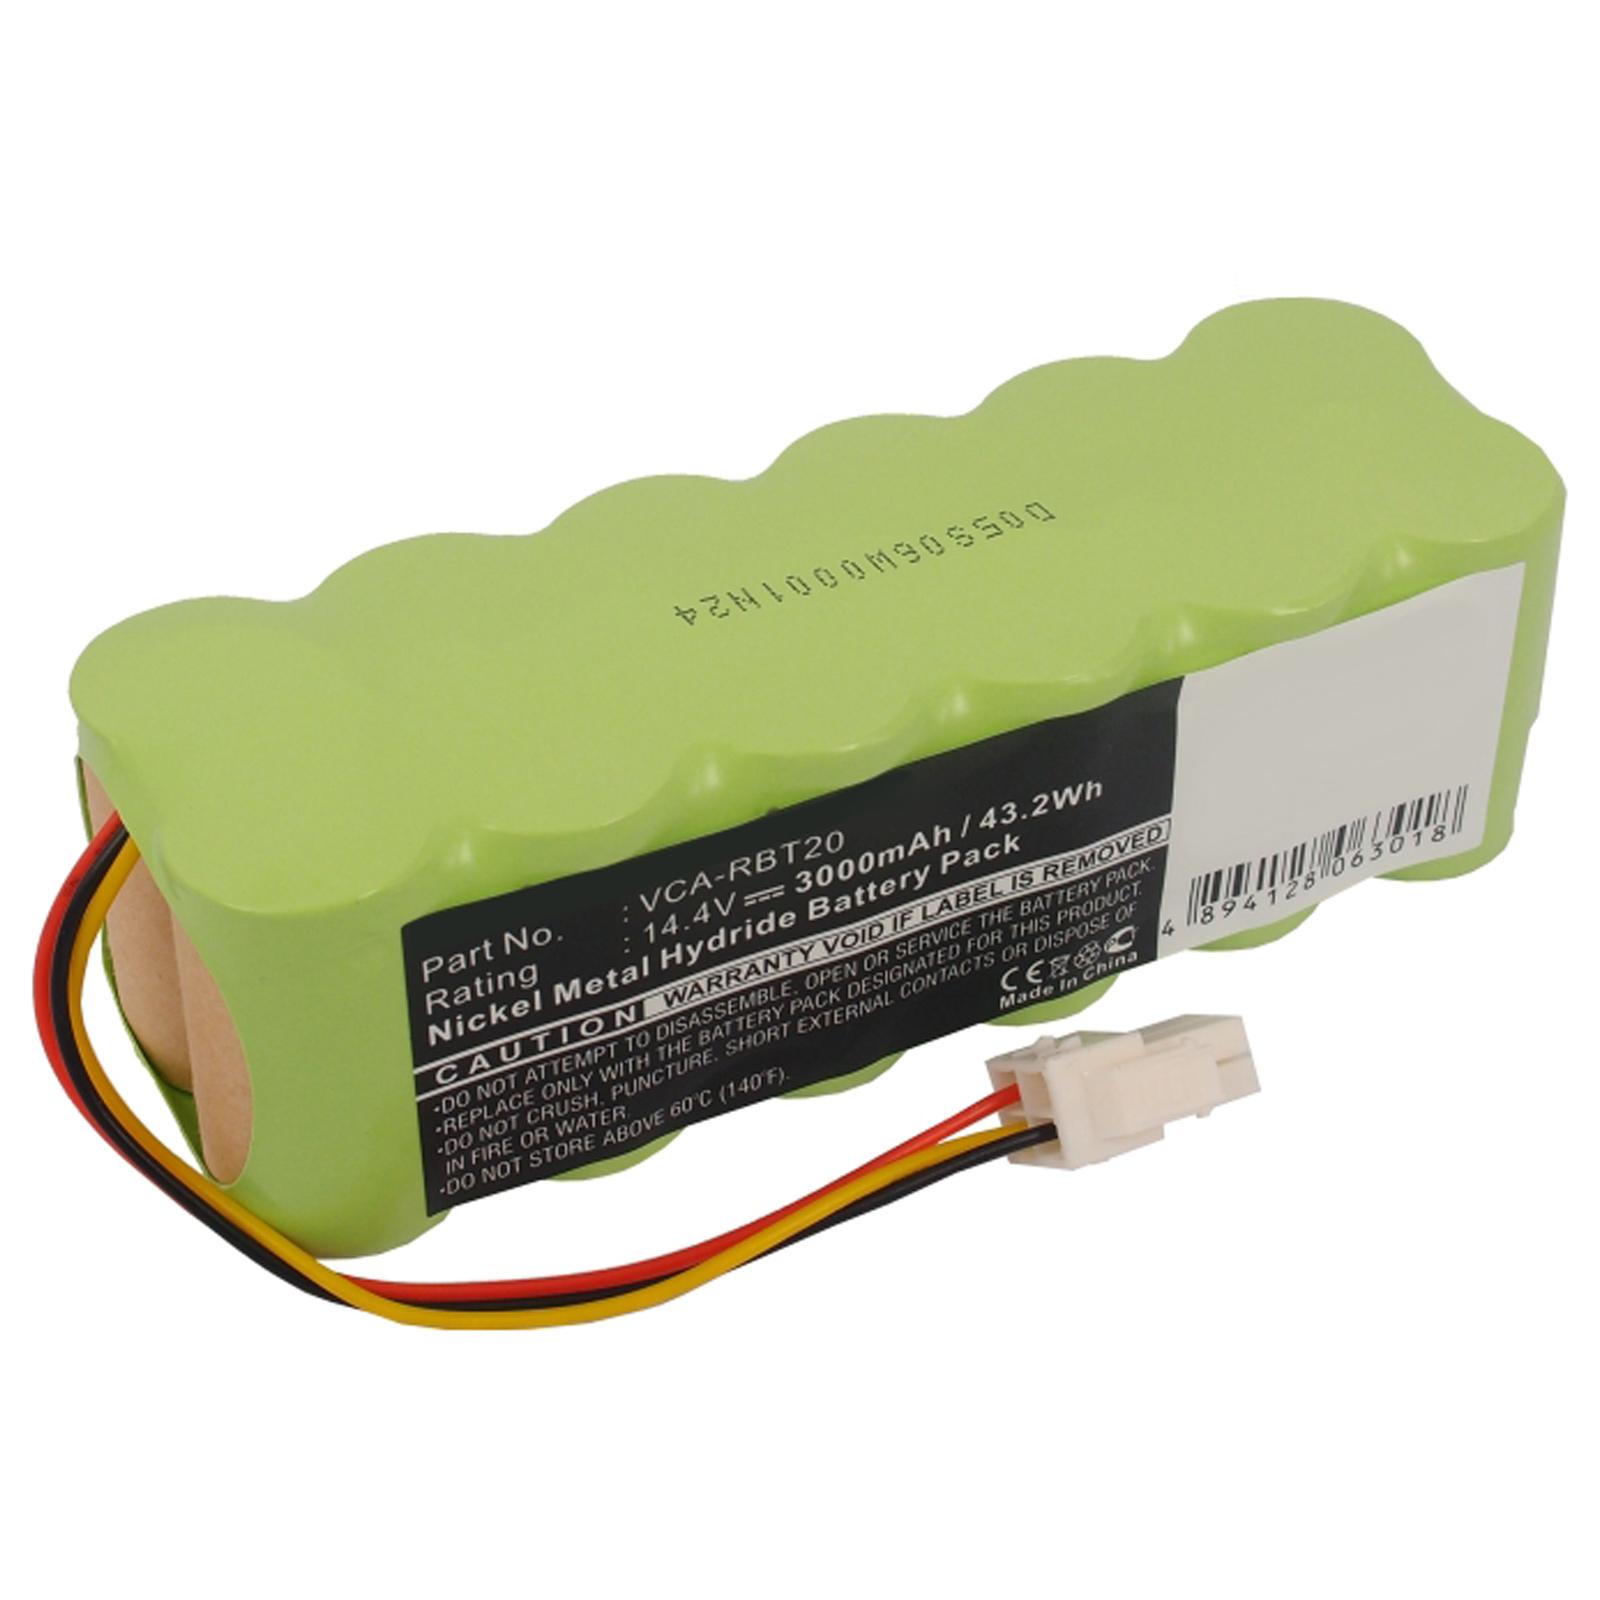 14.4V Battery Replaces DJ96-00113C VCA-RBT20 Fits Samsung ...